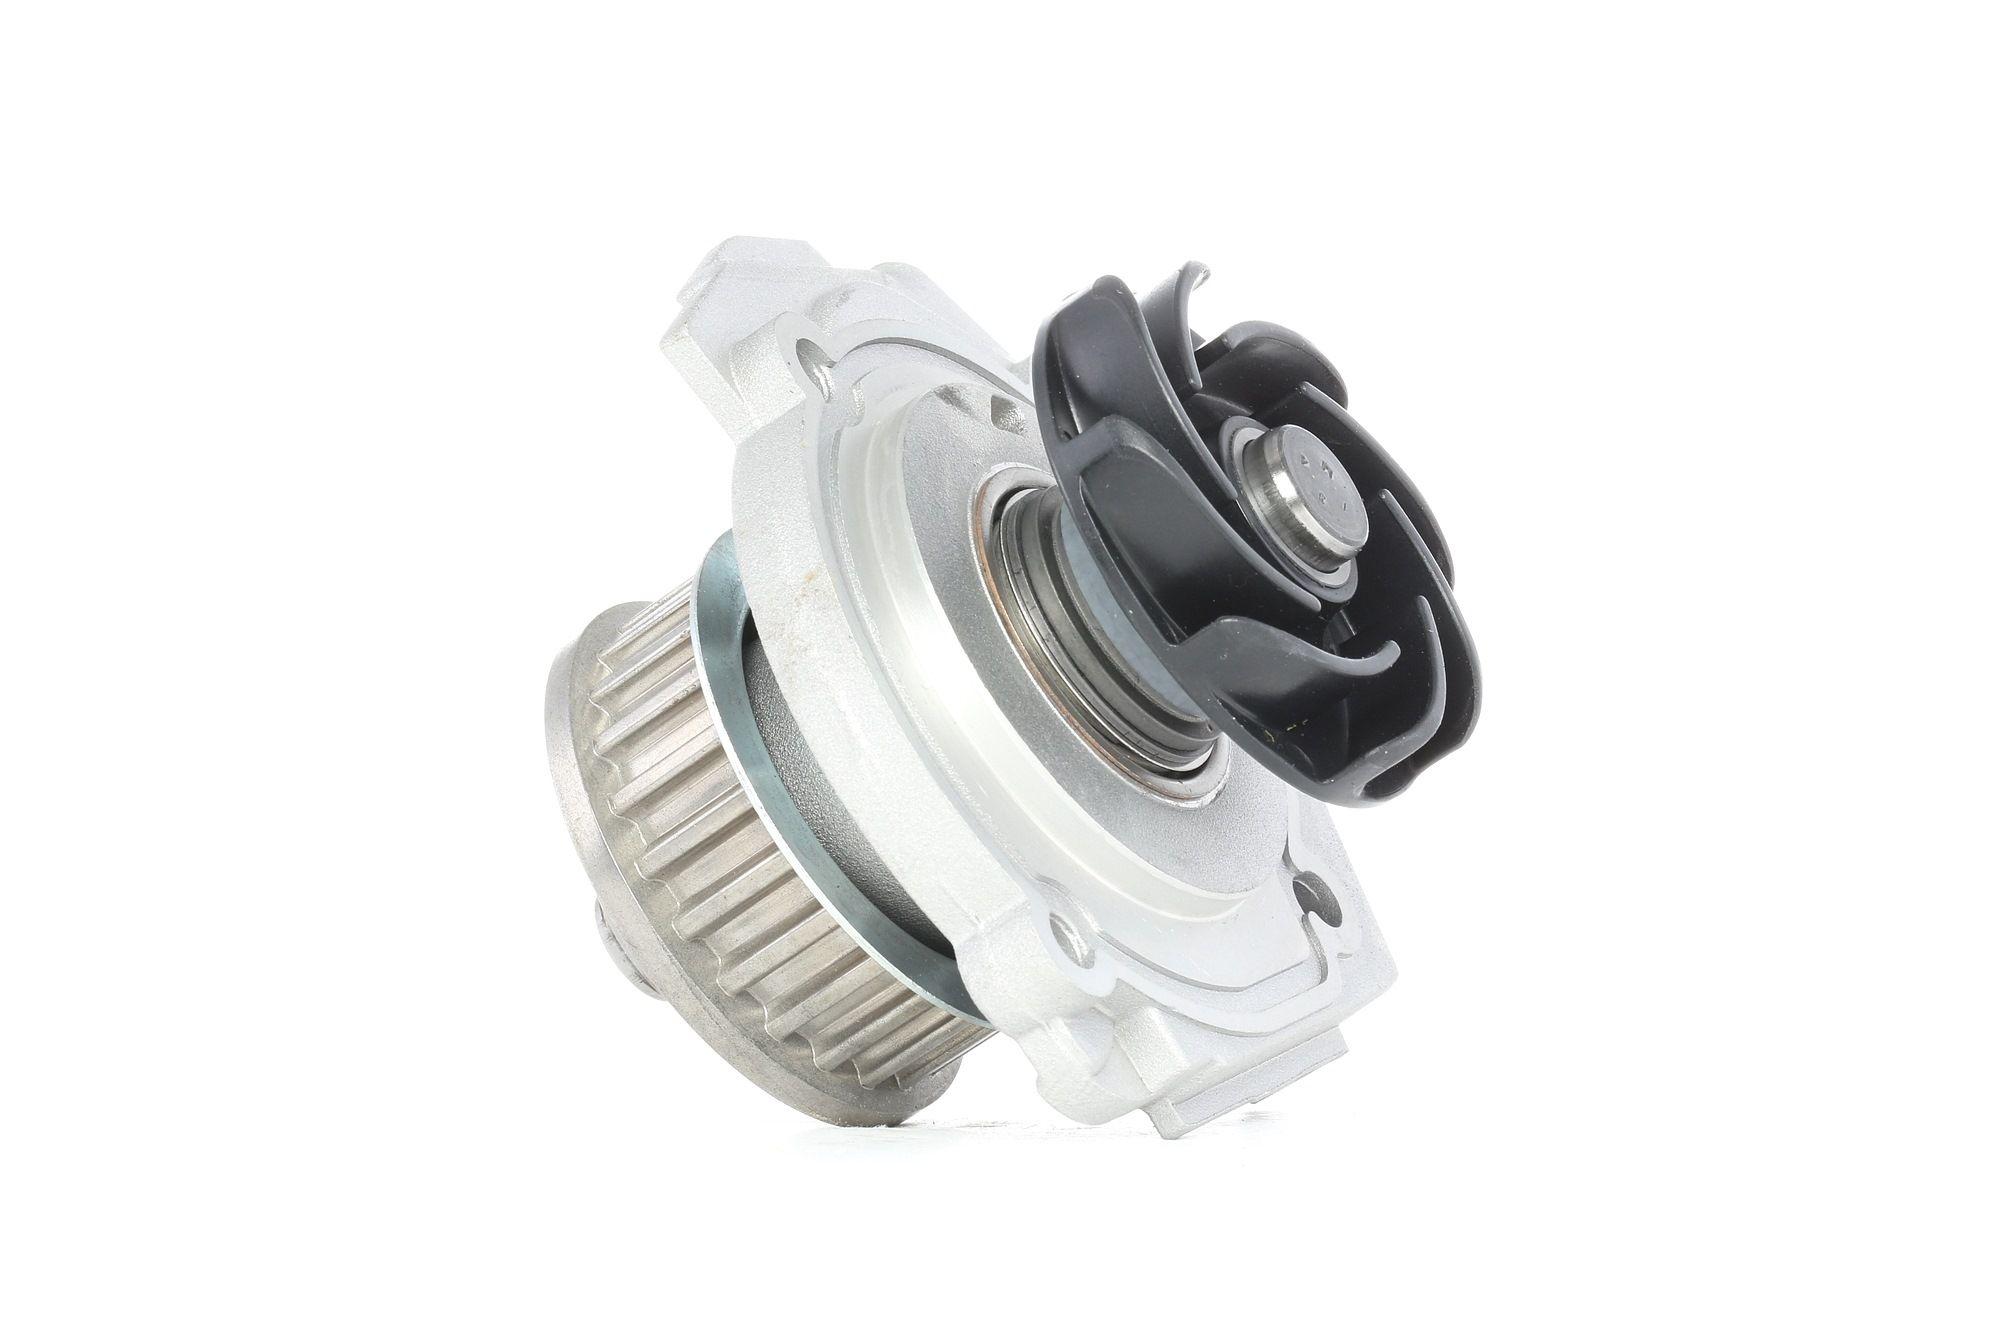 Pompa acqua 506640 acquista online 24/7